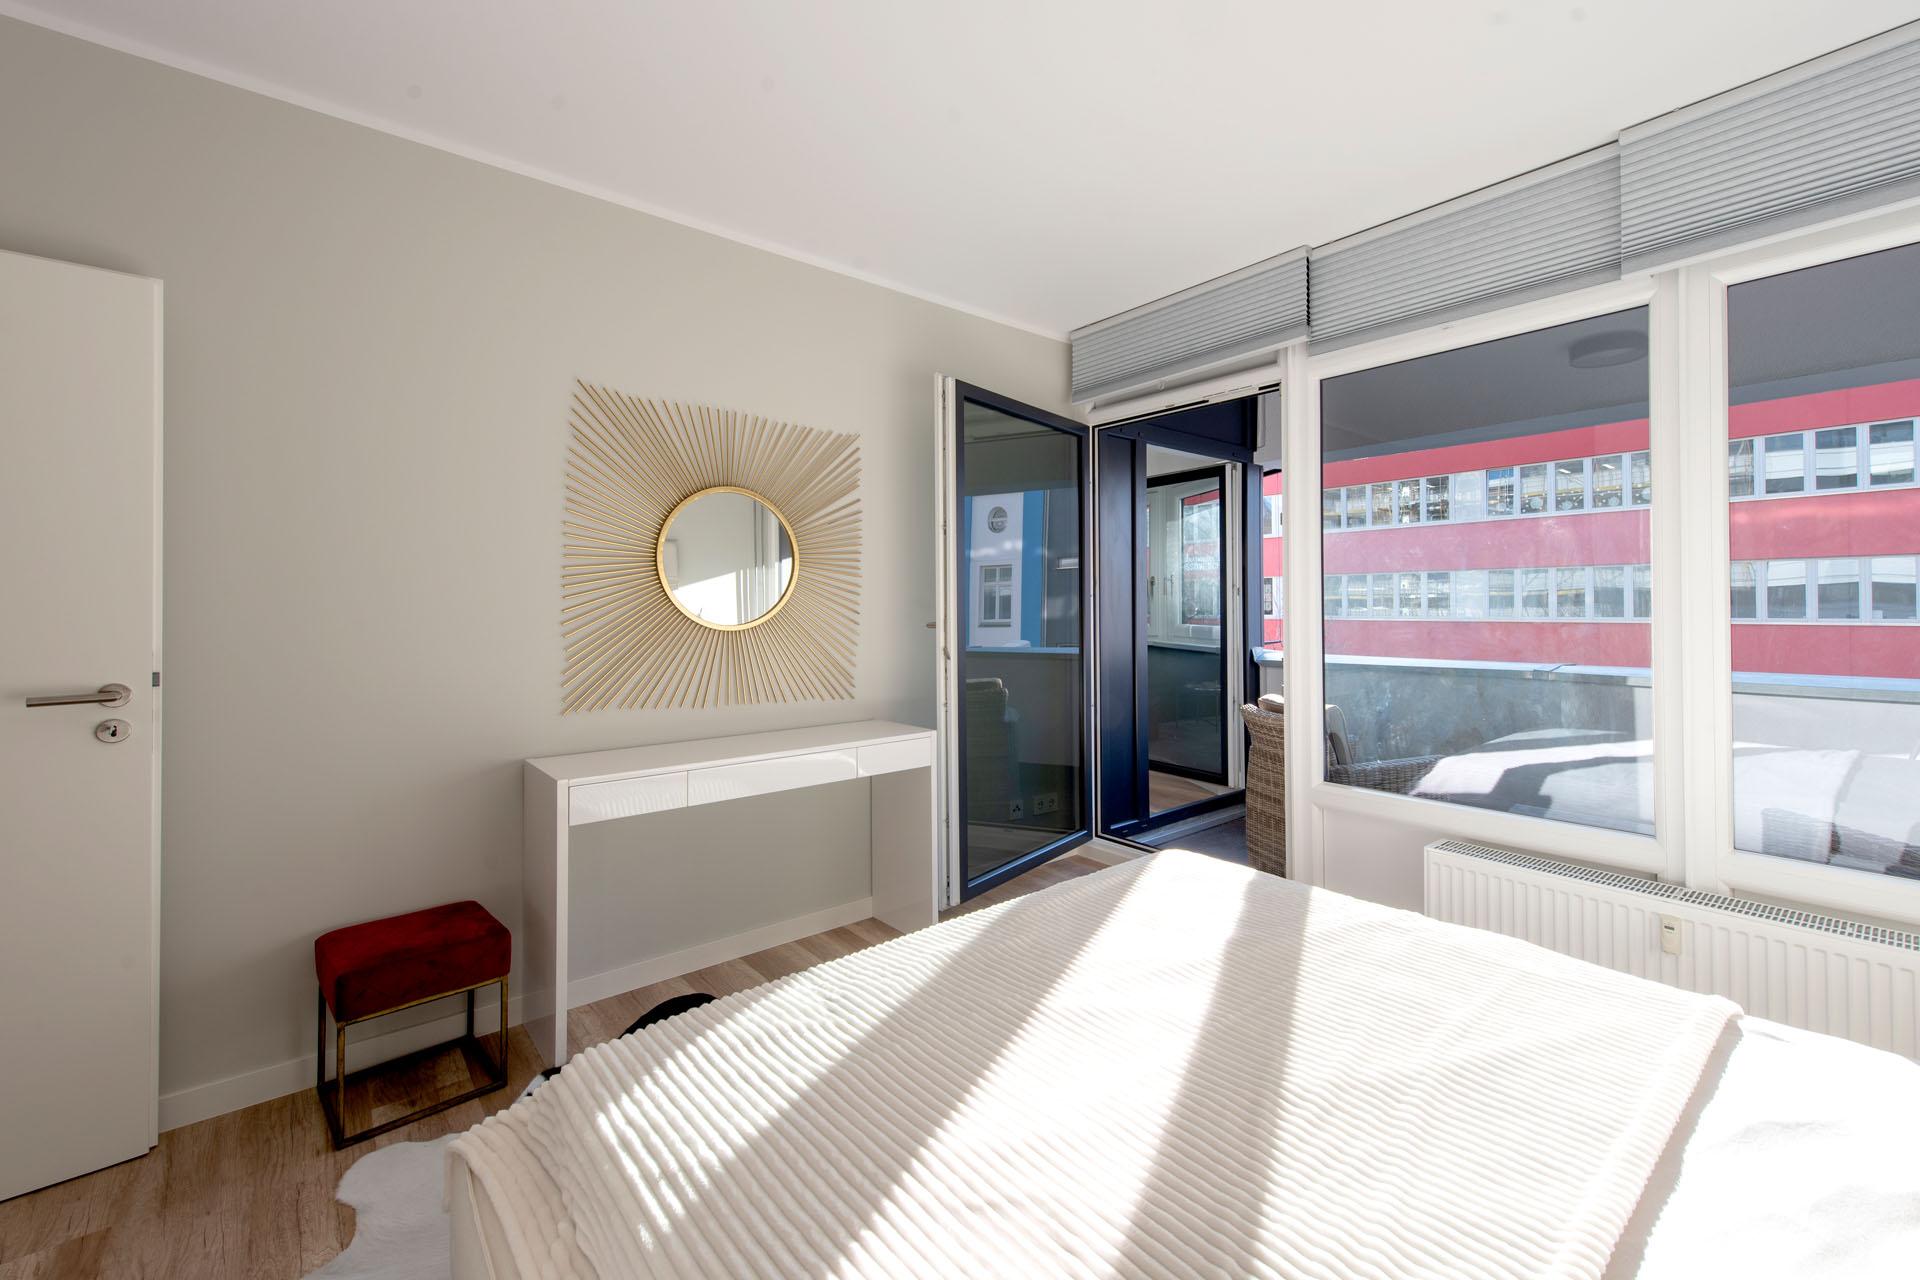 LYTZ - Lützowstrasse 37/39 - Schlafzimmer - Balkon